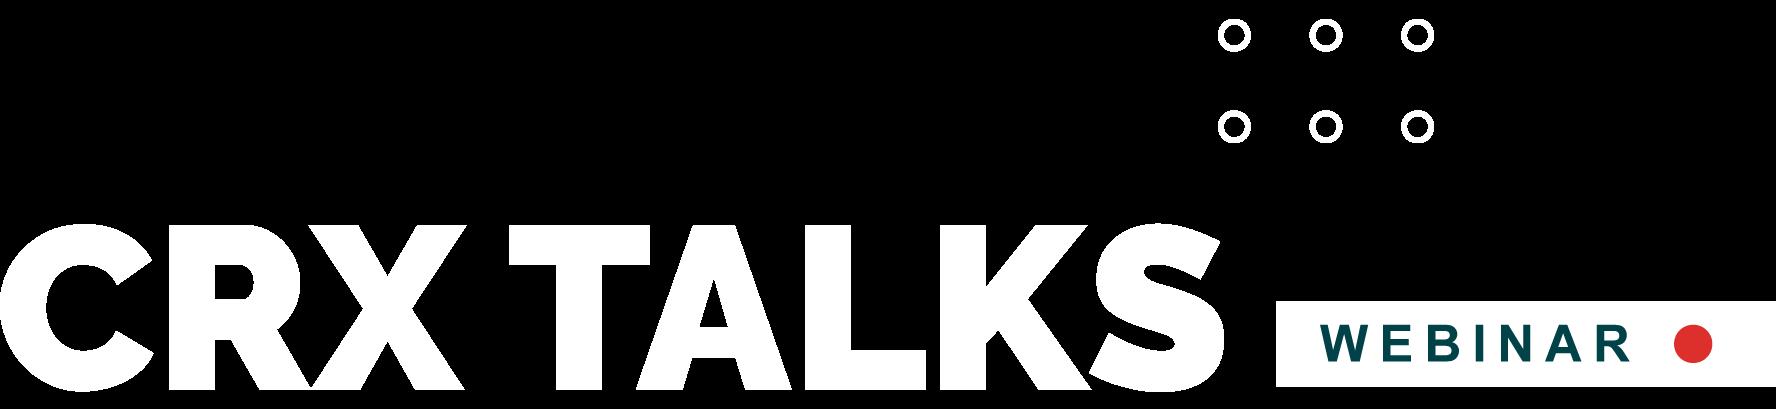 WEBINAR-CRX-TALKS--tiulo